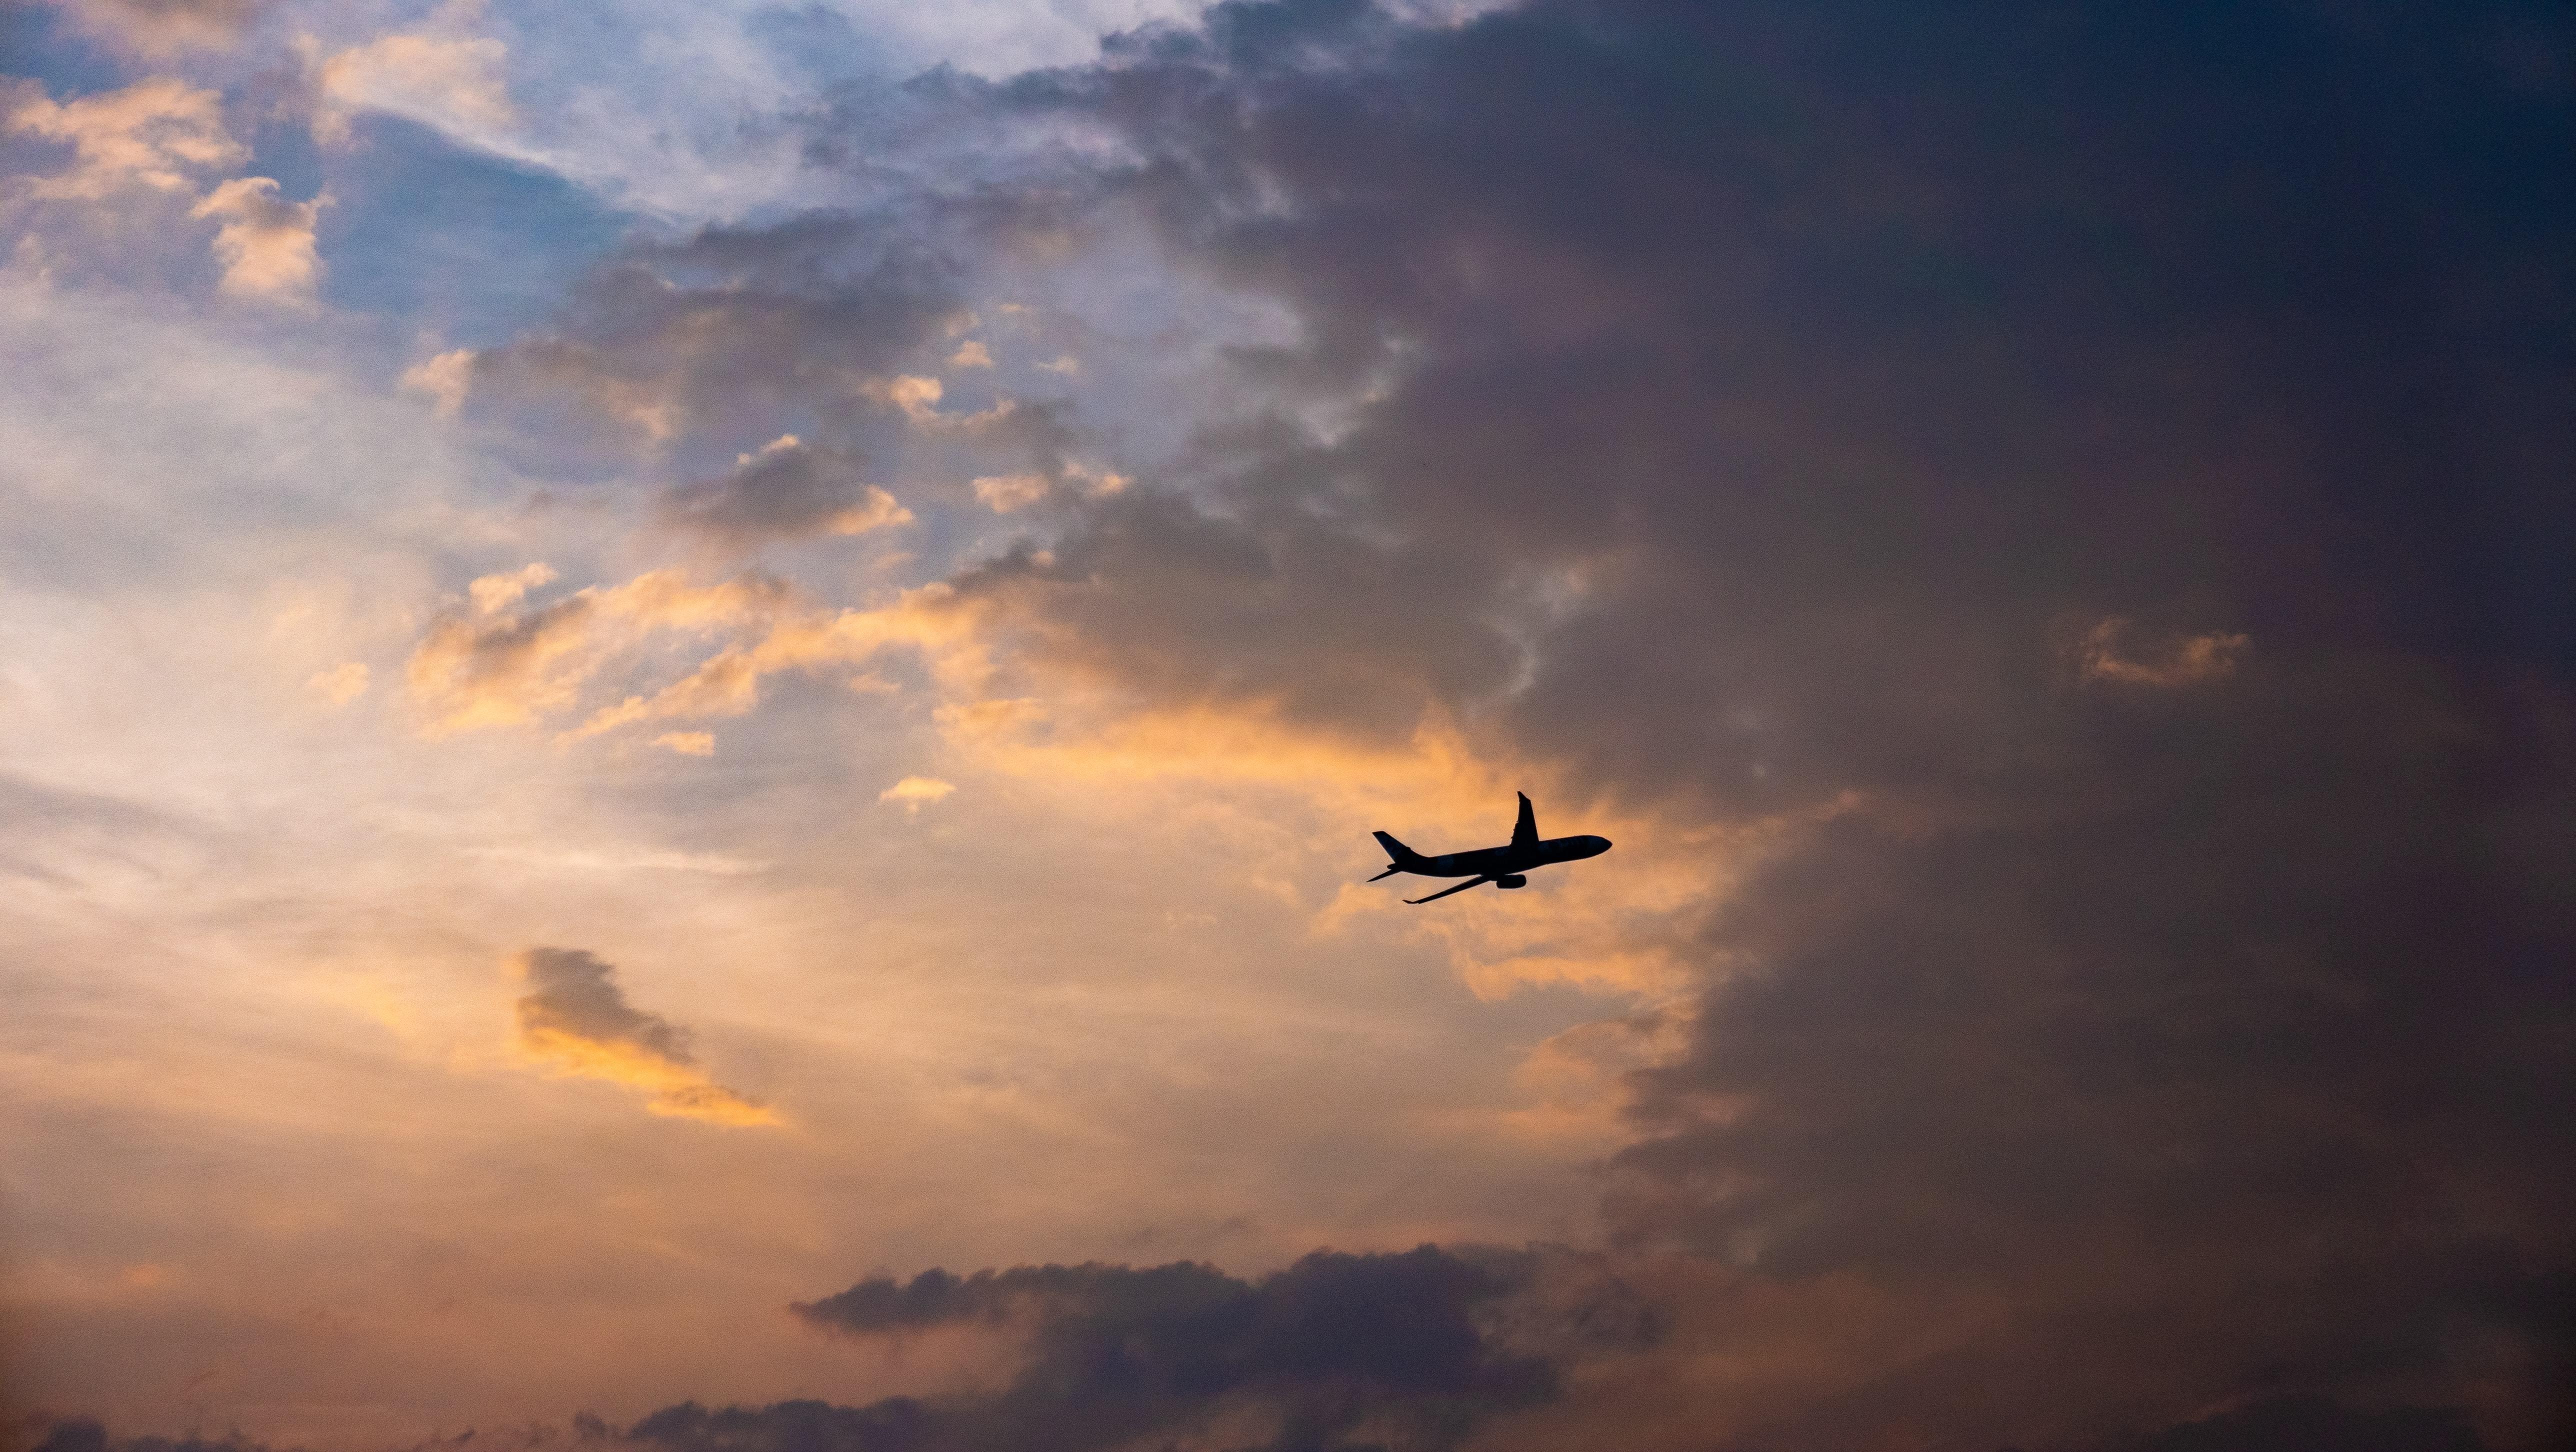 aeroplane flight tourism hydrogen powered engine zero emission sustainable aviation plane innovation technology green zeroavia